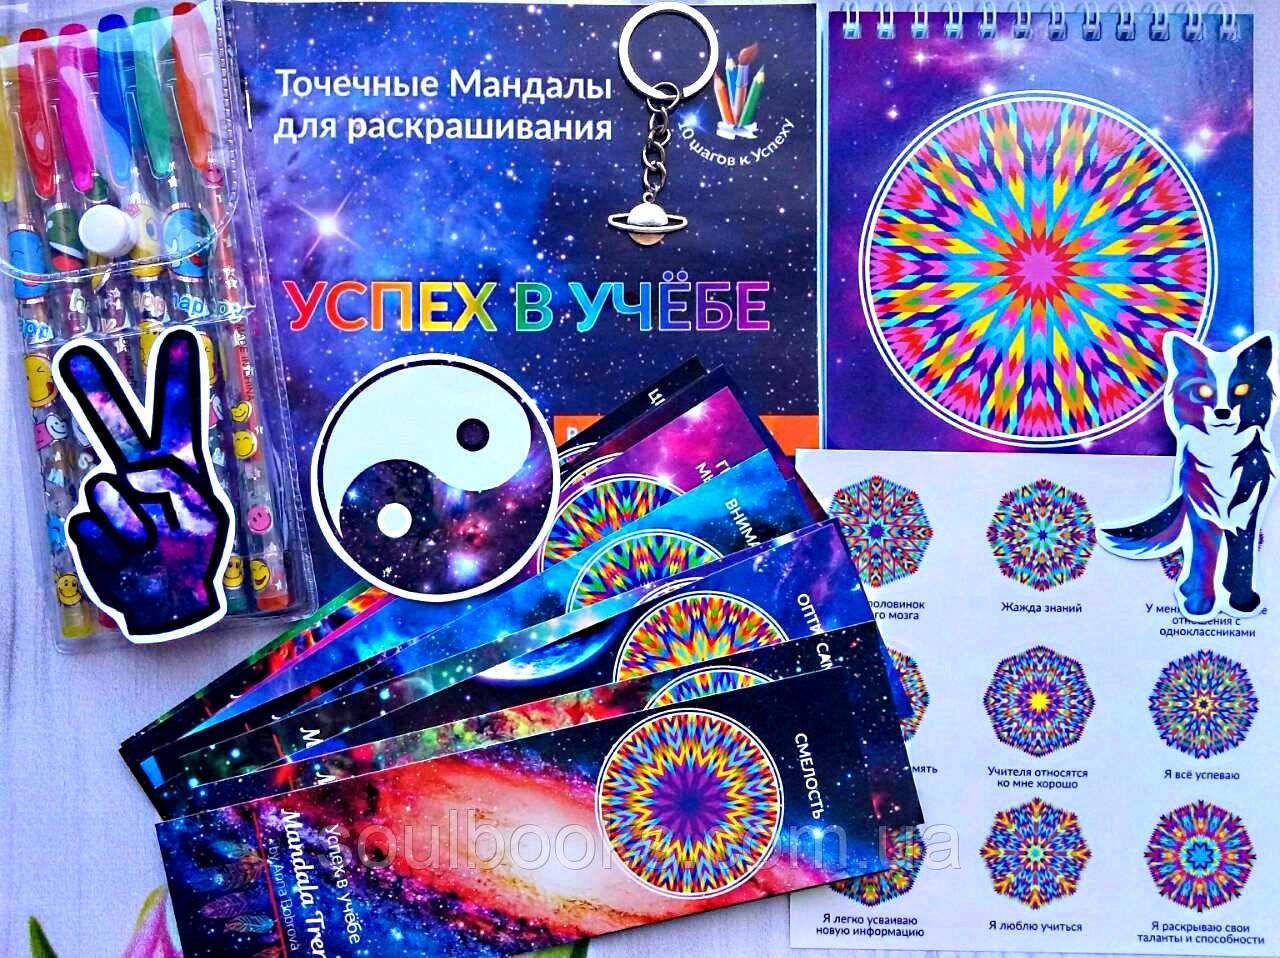 Мандала-box«Успех в учебе» (Боброва Анна)